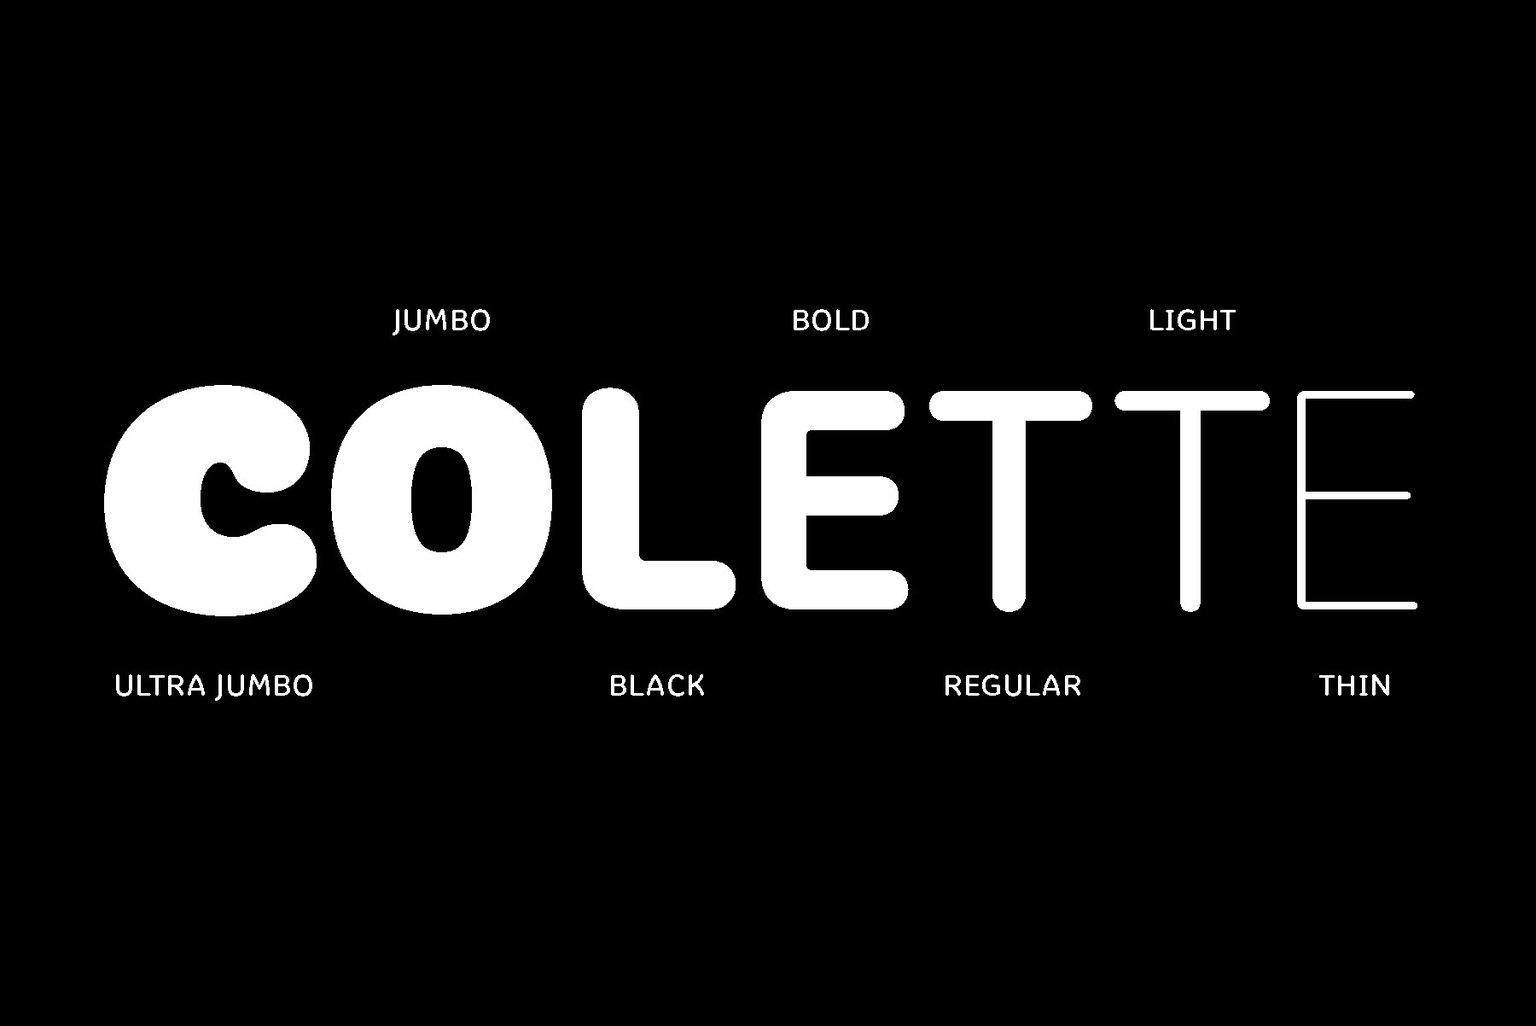 Vllg colette news